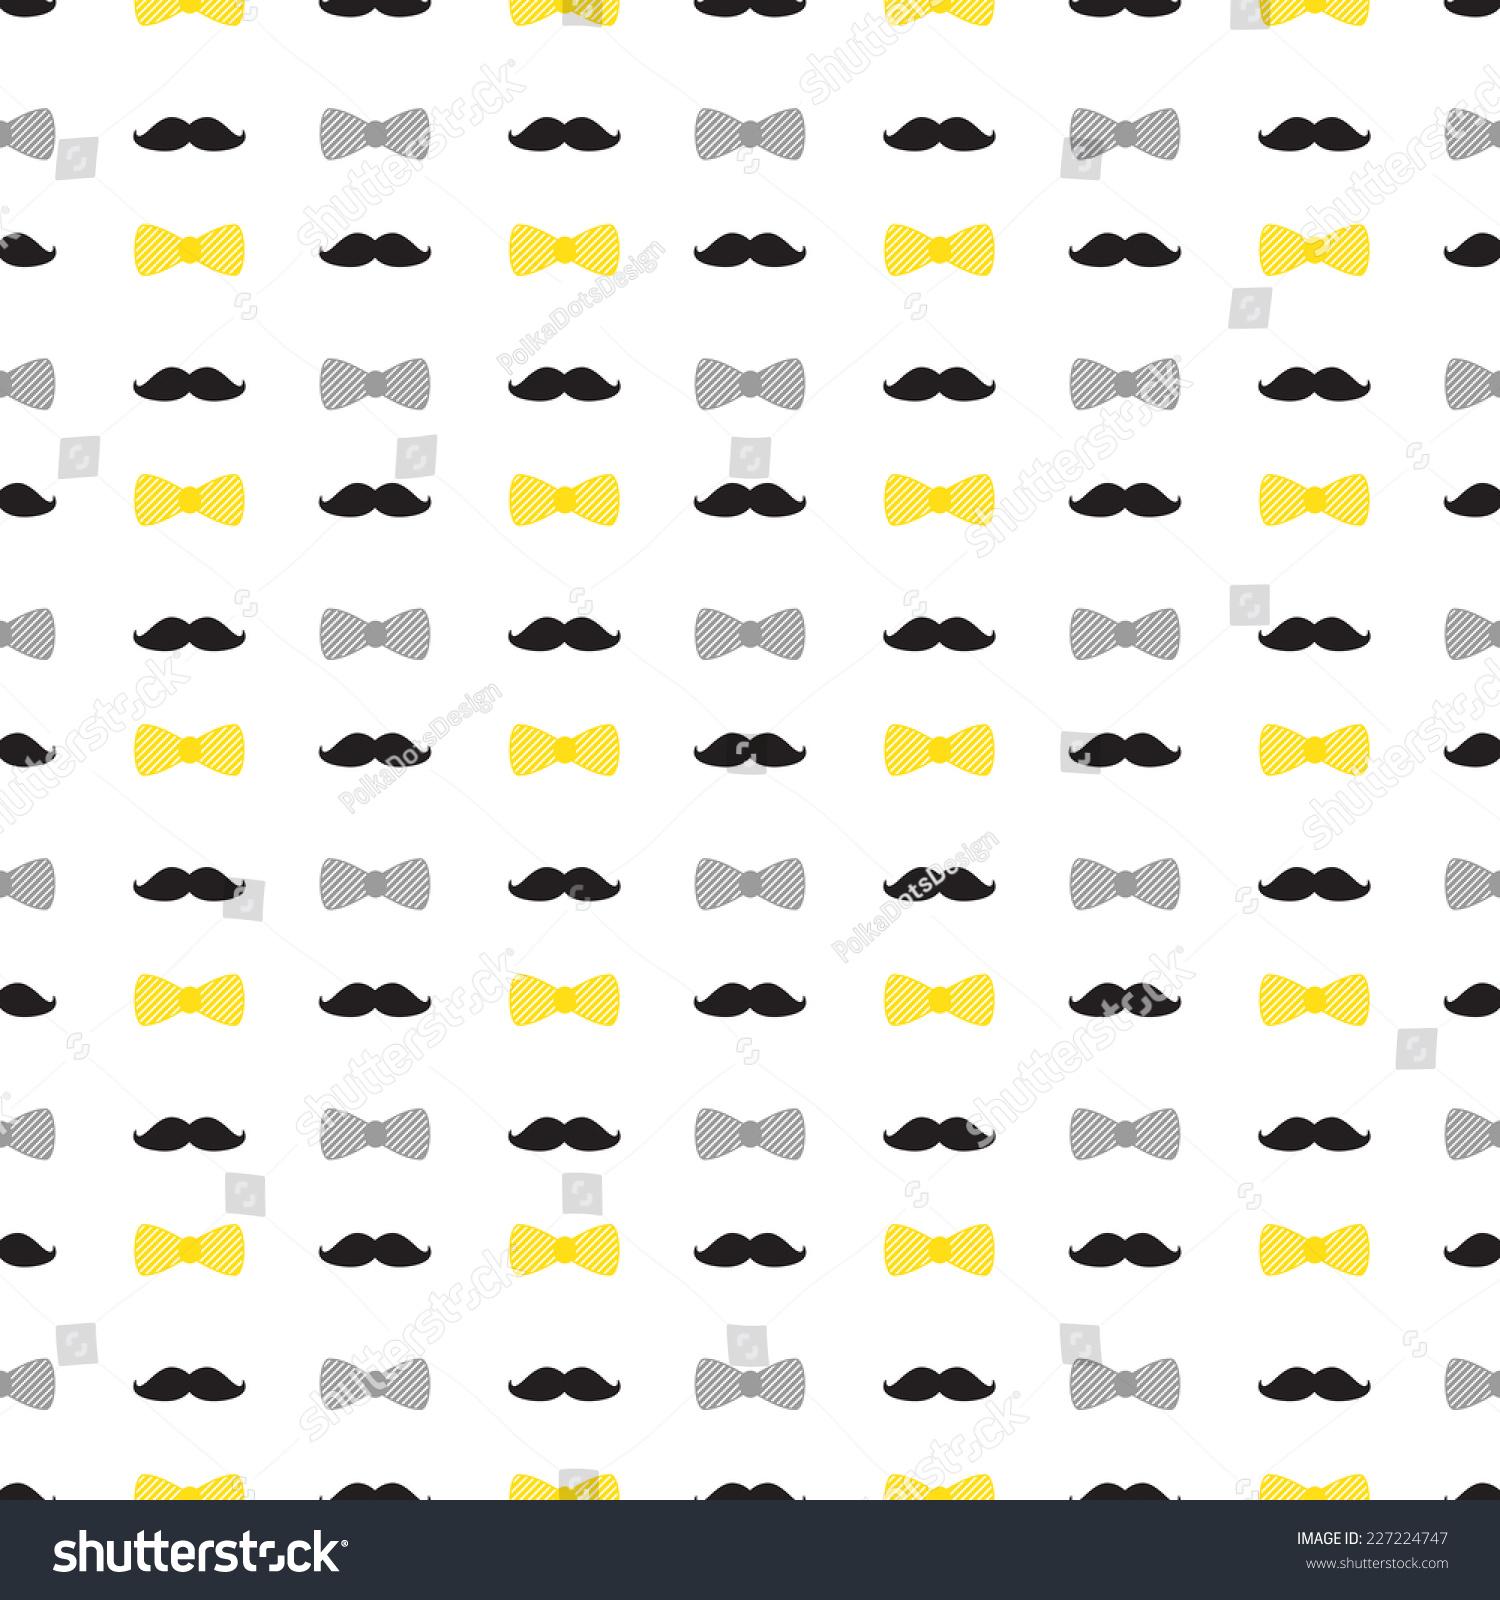 Royalty-free Little man seamless pattern. Black